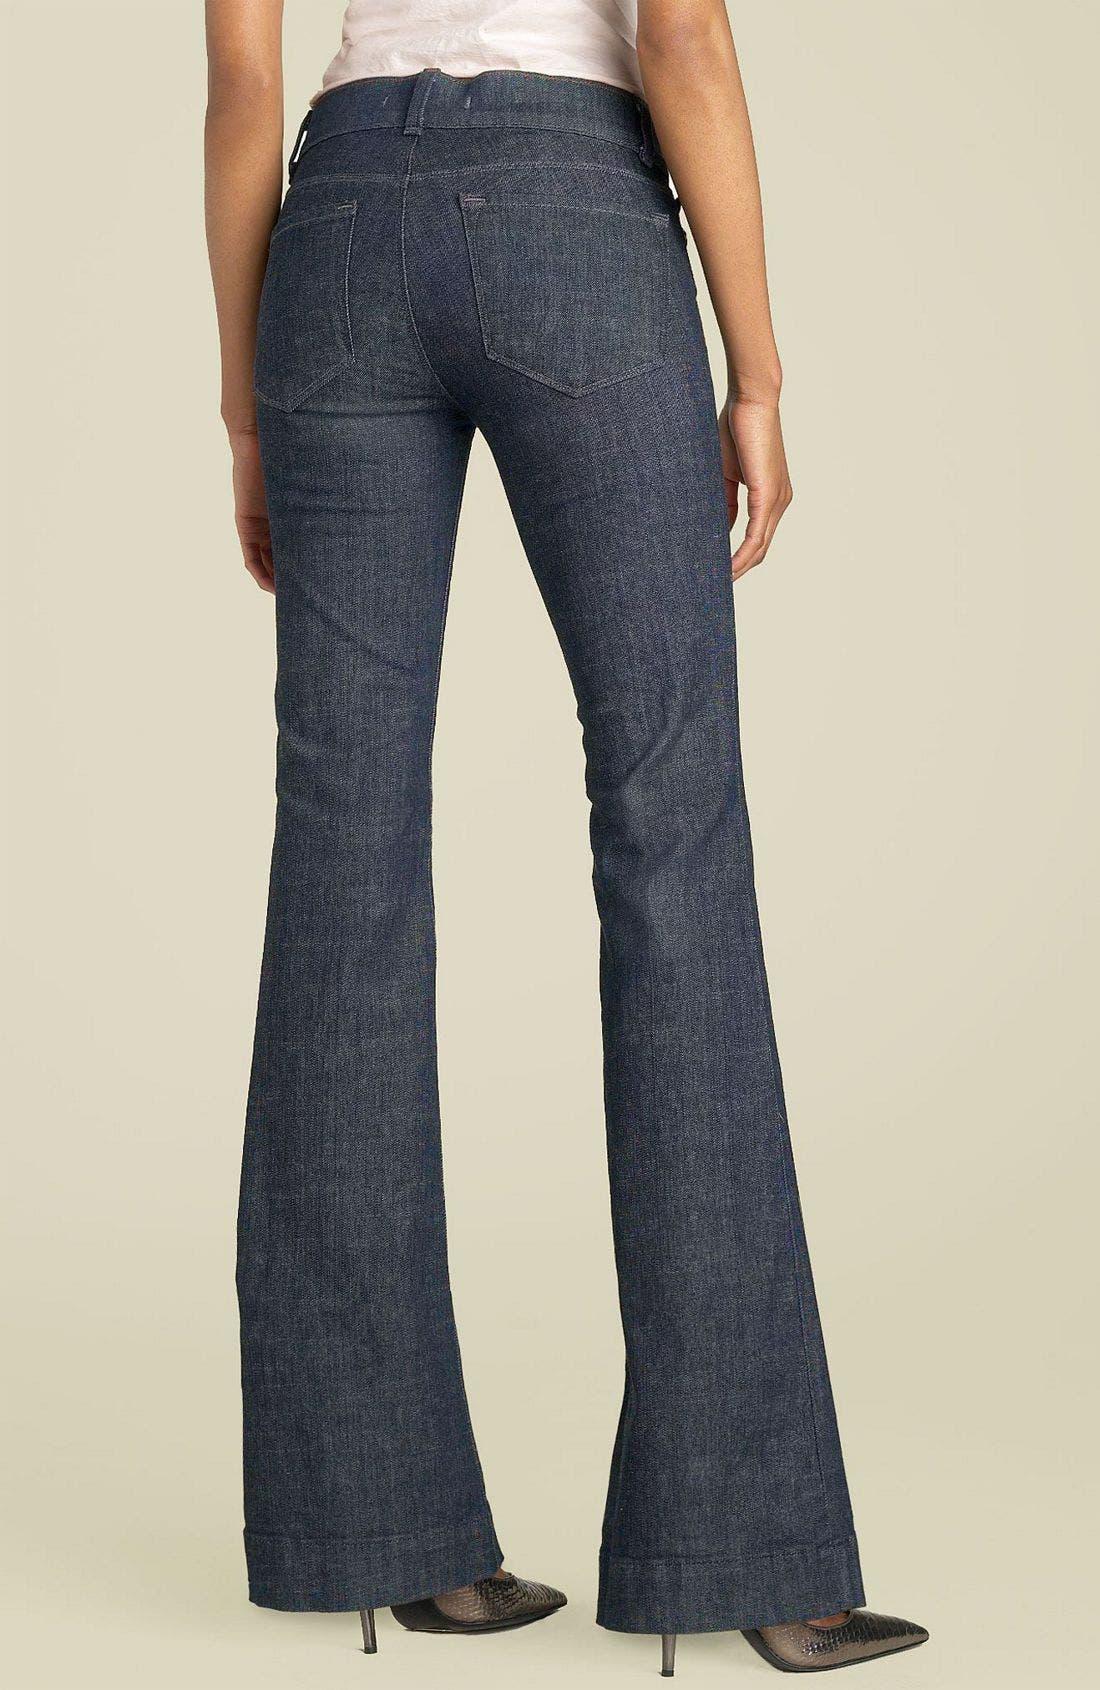 Alternate Image 1 Selected - J Brand 'Lovestory' Low Rise Bell Bottom Stretch Jeans (Miner)